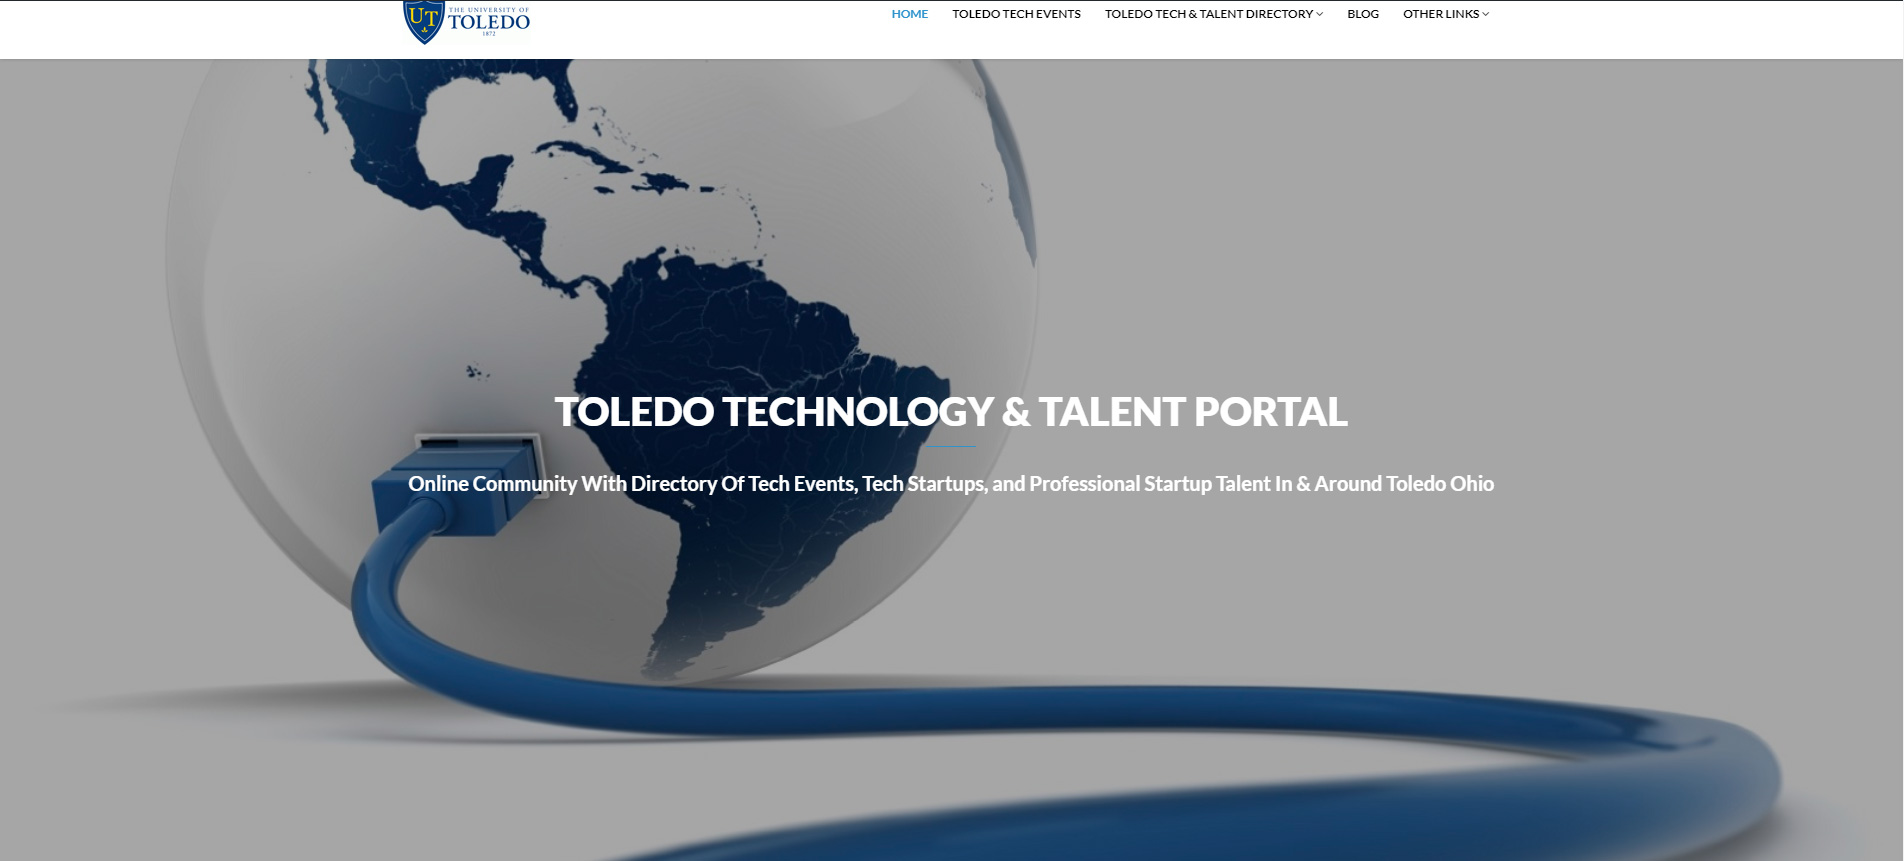 Toledo Technology & Talent Portal For University of Toledo